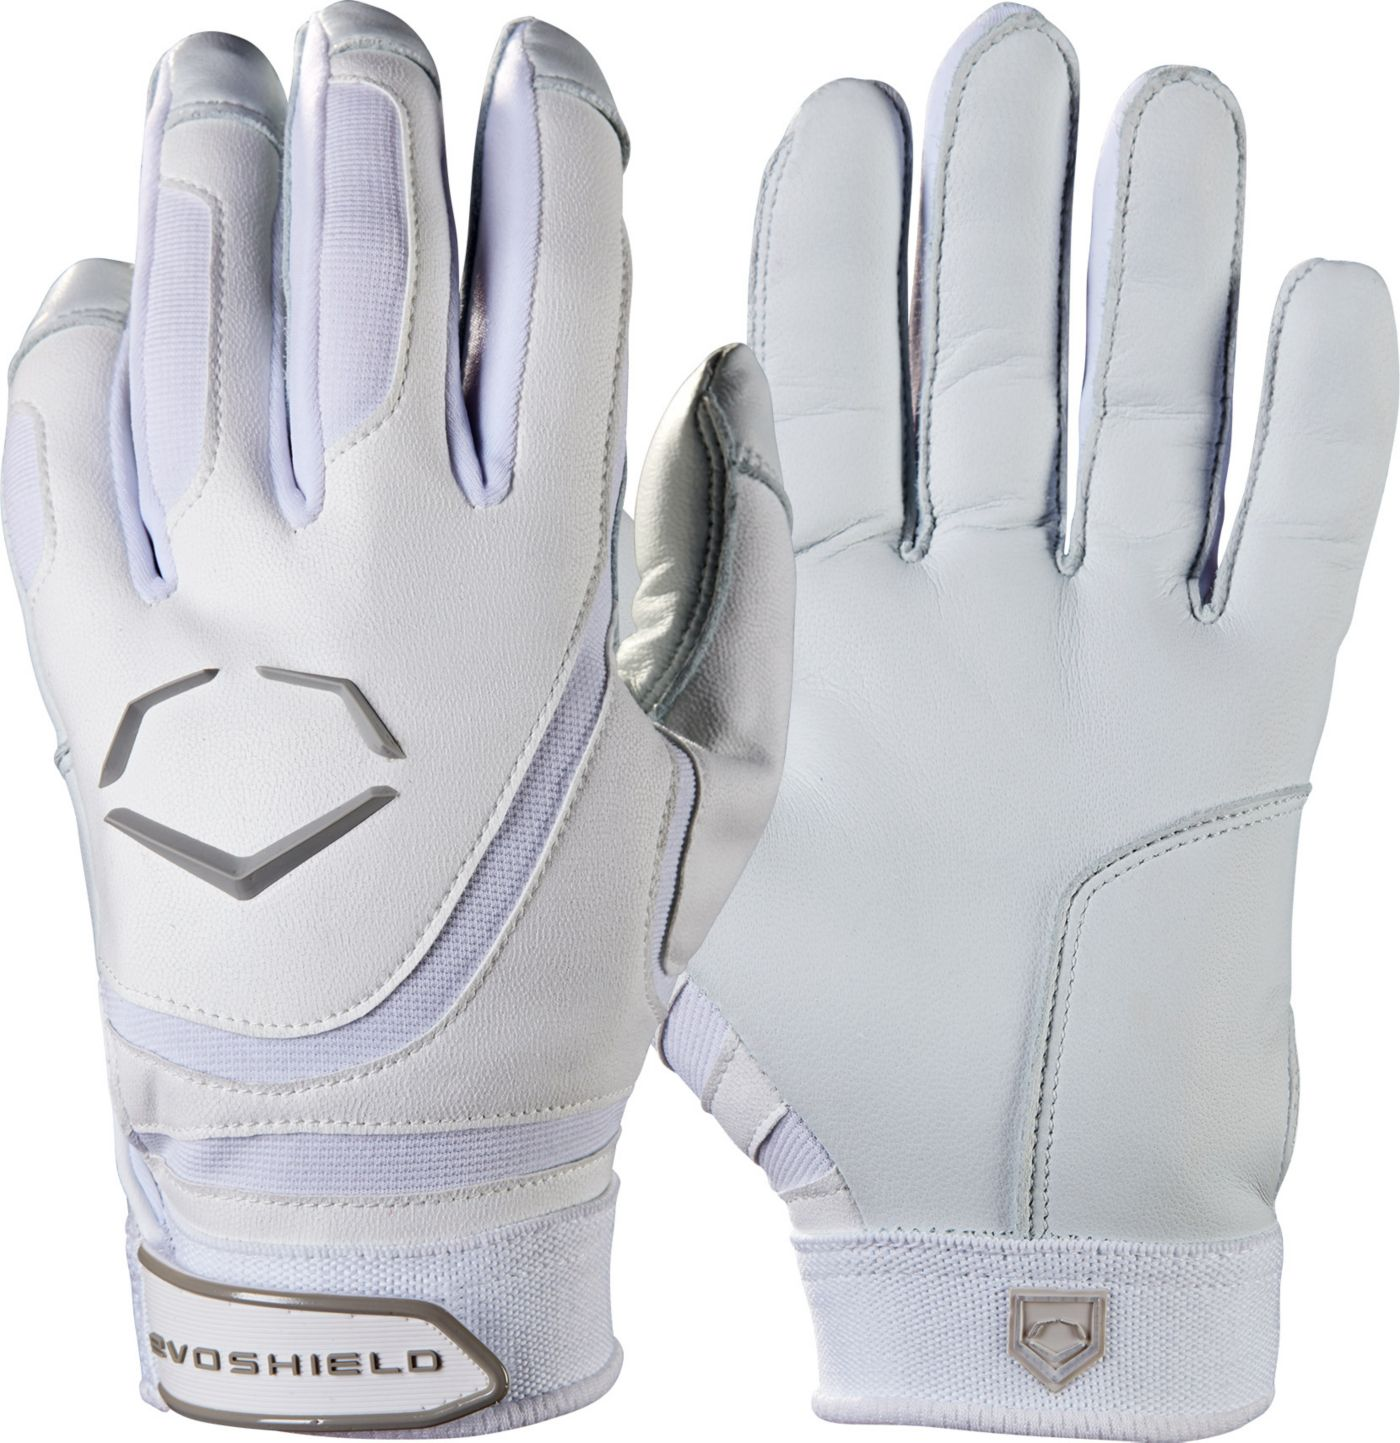 EvoShield Women's EvoRISE Fastpitch Batting Gloves